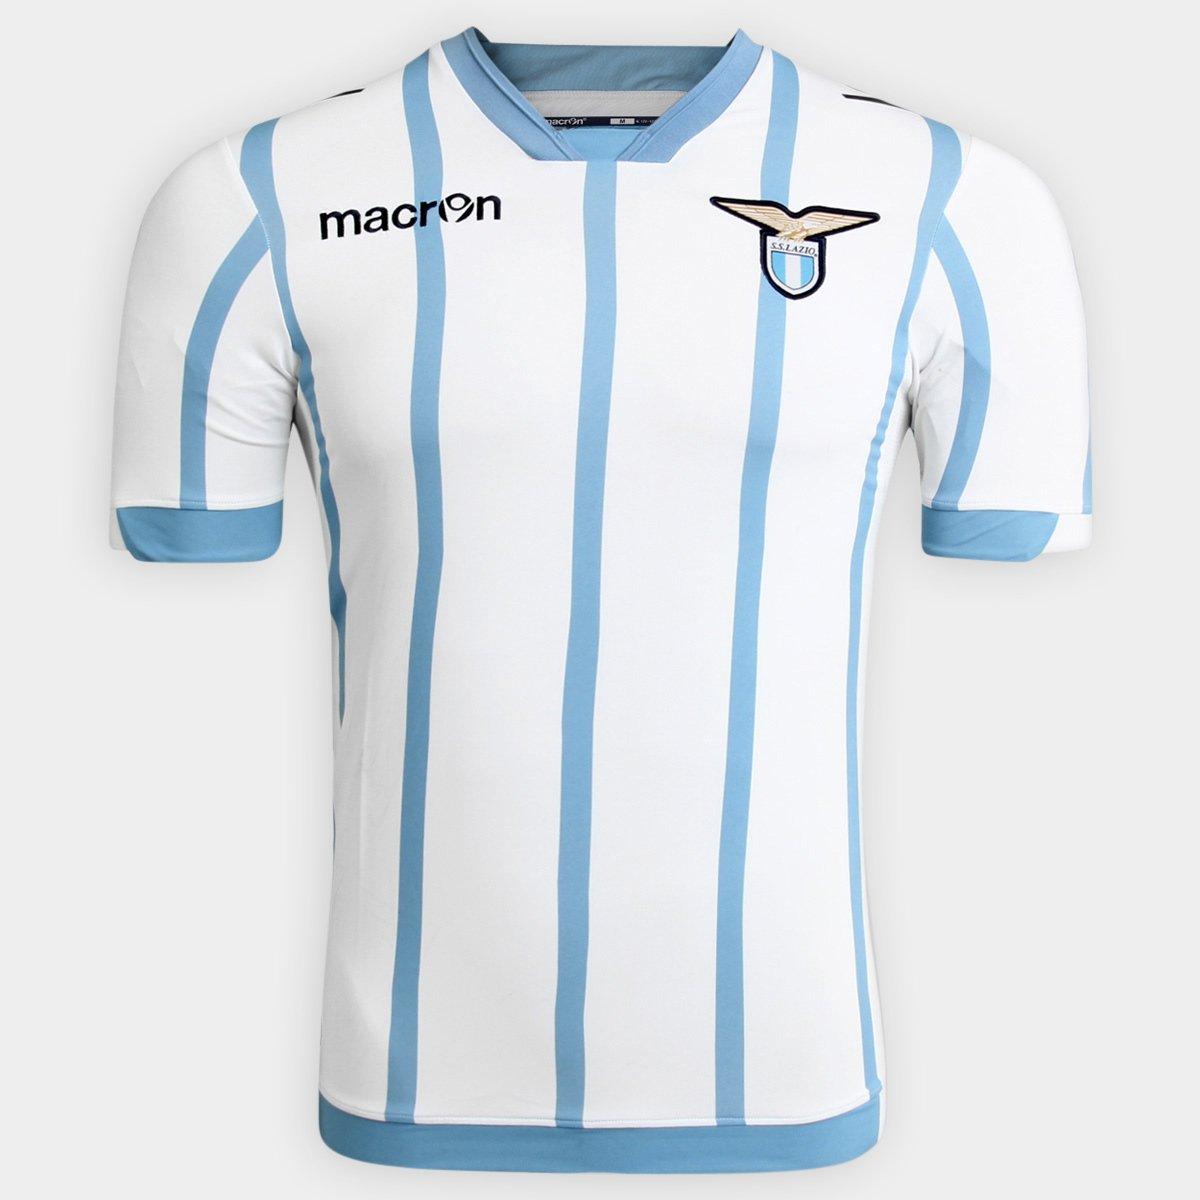 Camisa Lazio Third 14 15 s nº Torcedor Macron Masculina - Compre Agora  9968f5f11f1c1